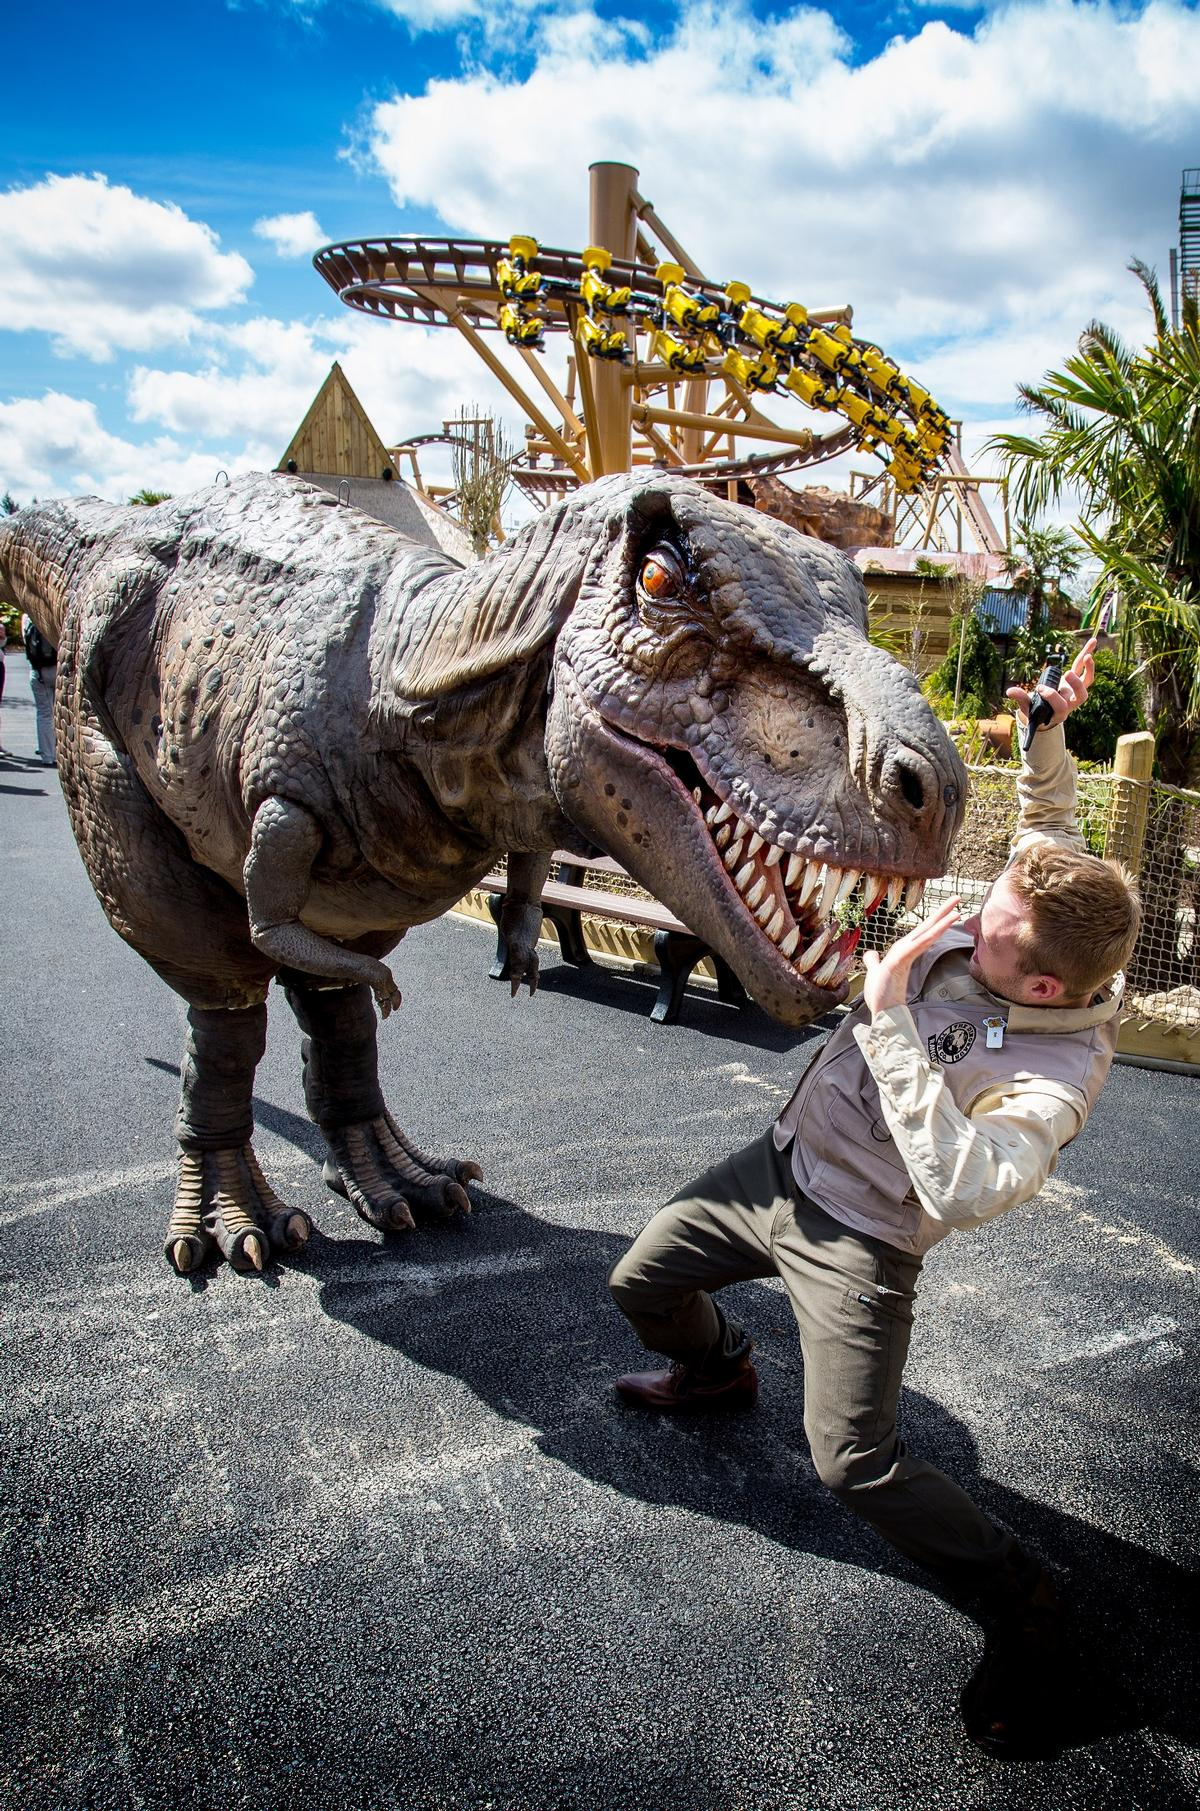 Meet T-Rex at the Alive Dinosaur Encounter